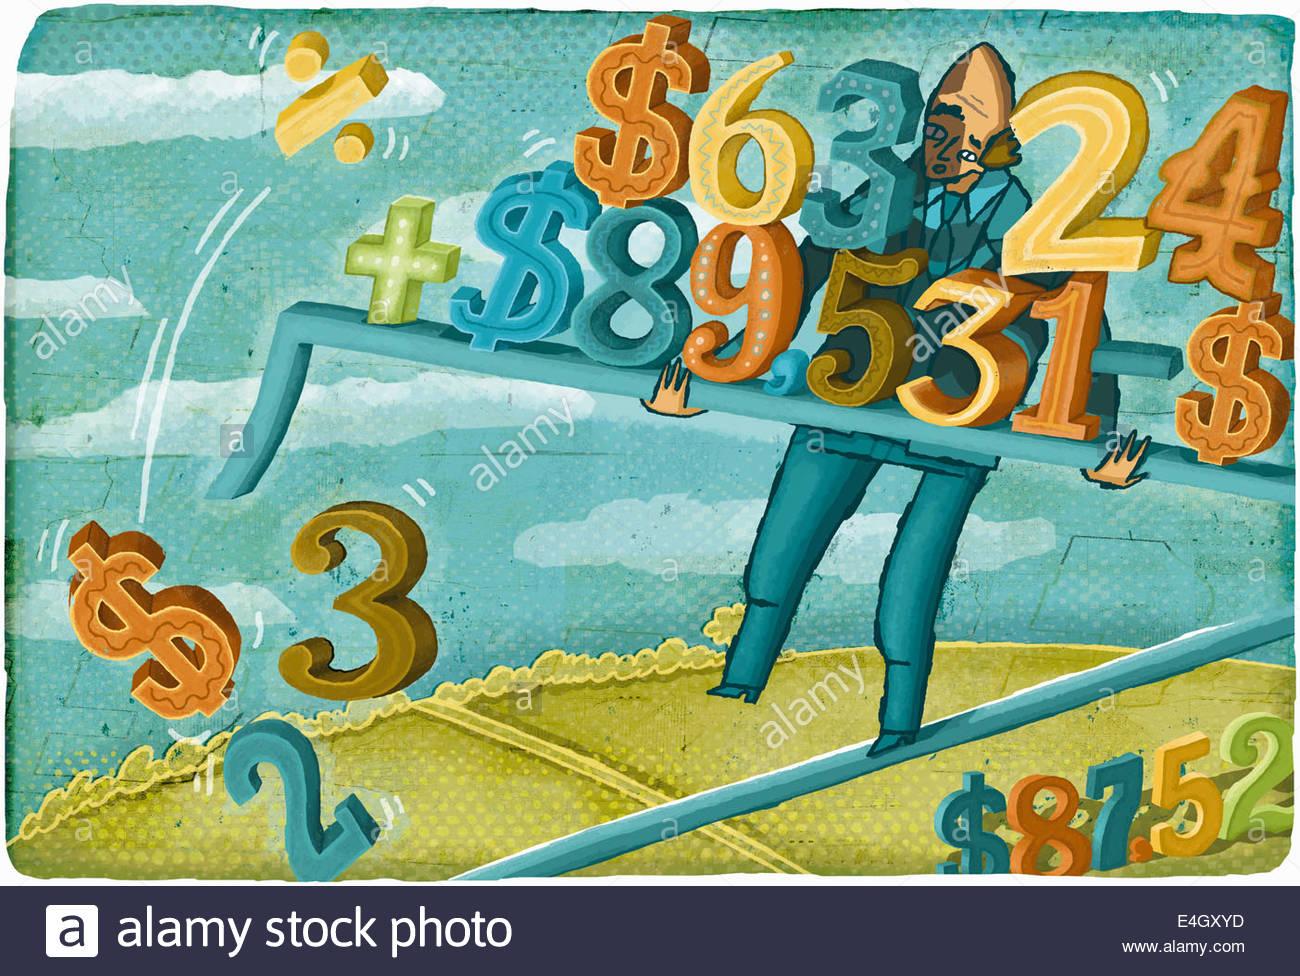 Stressed businessman walking tightrope balancing falling dollar calculations - Stock Image